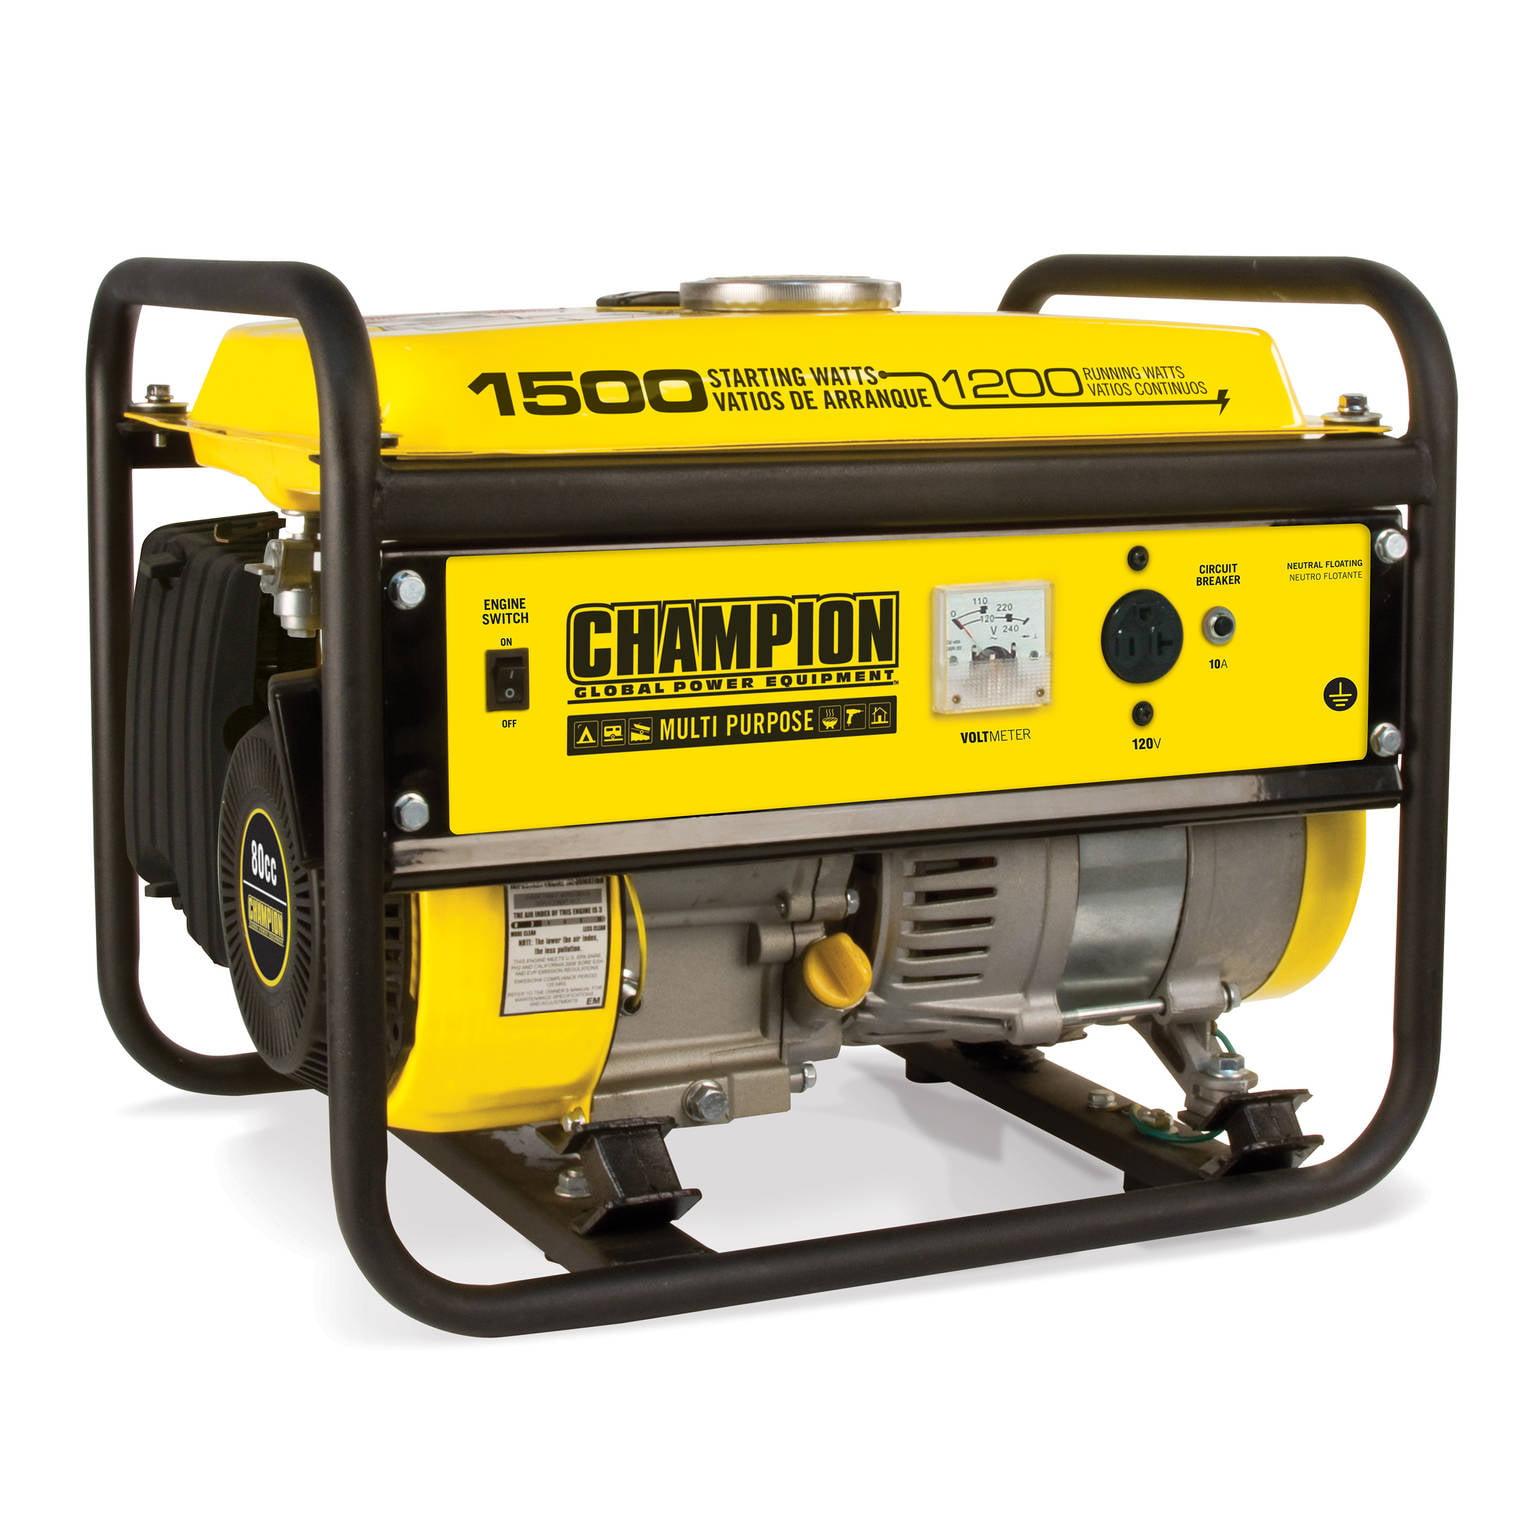 Champion 100490 1200-Watt Portable Generator by Champion Power Equipment